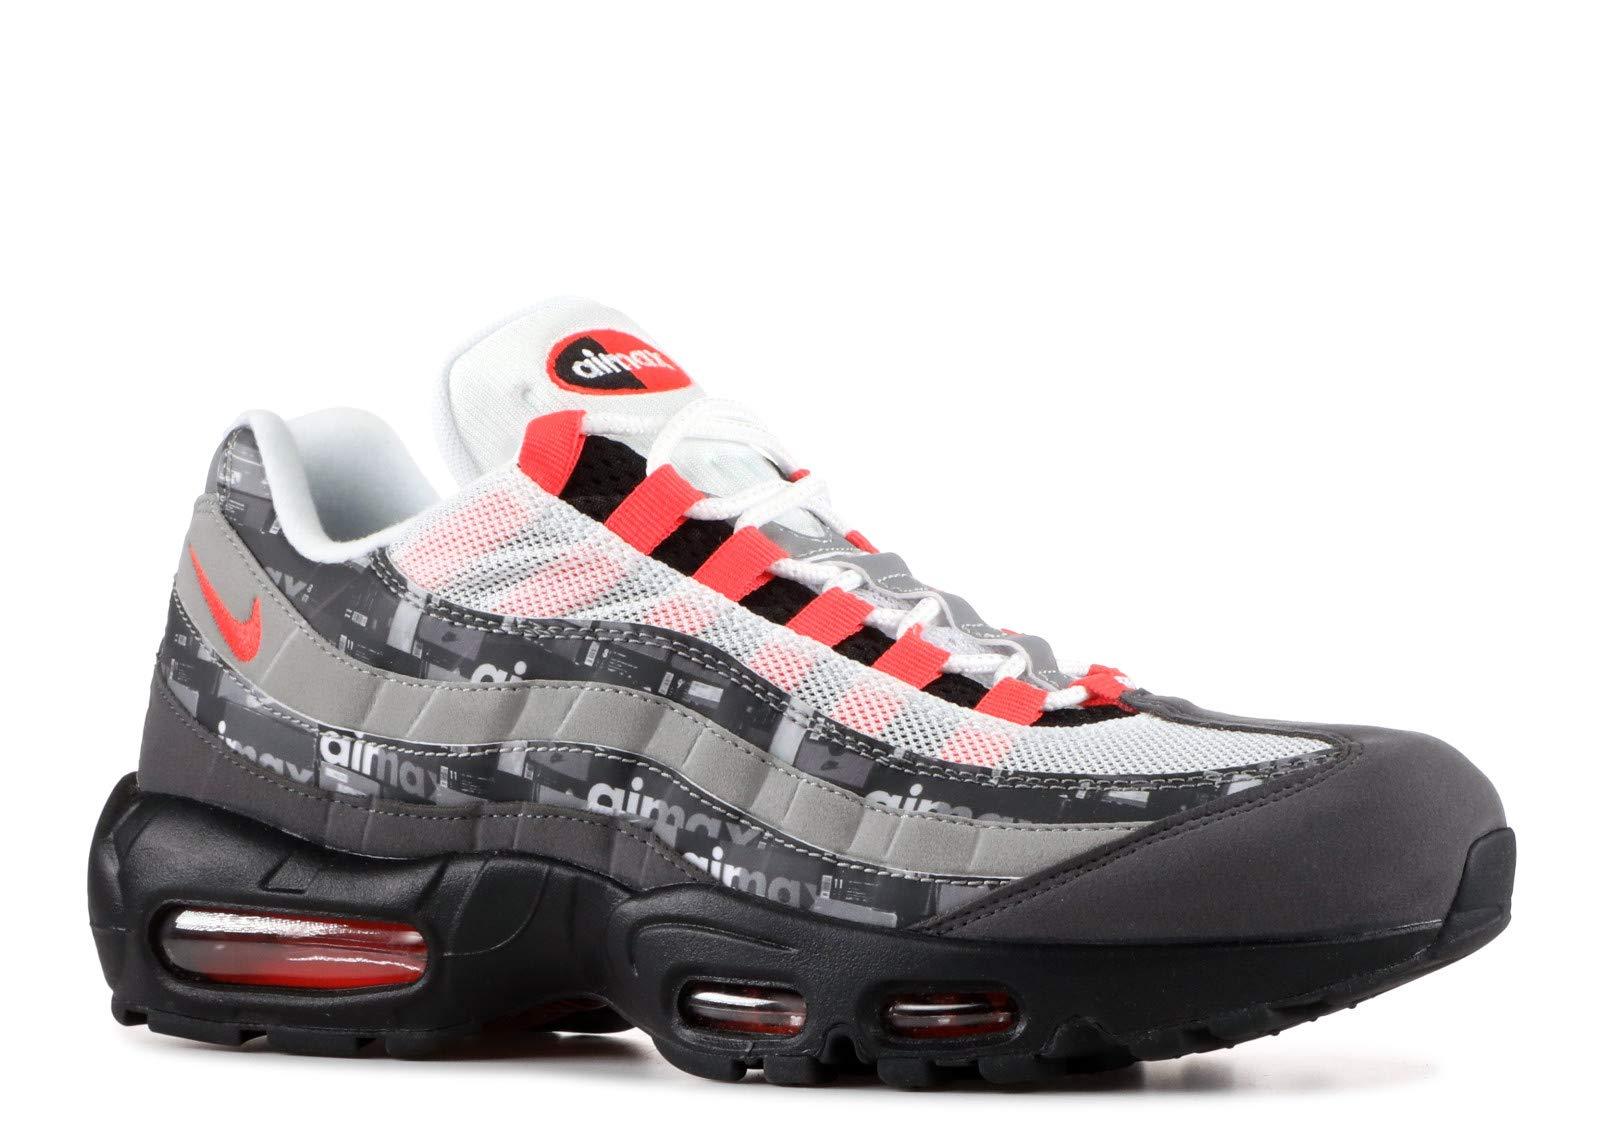 4ed2679b58 Galleon - Nike Air Max 95 PRNT - Aq0925-002 - Size 6.5 Black, Bright Crimson